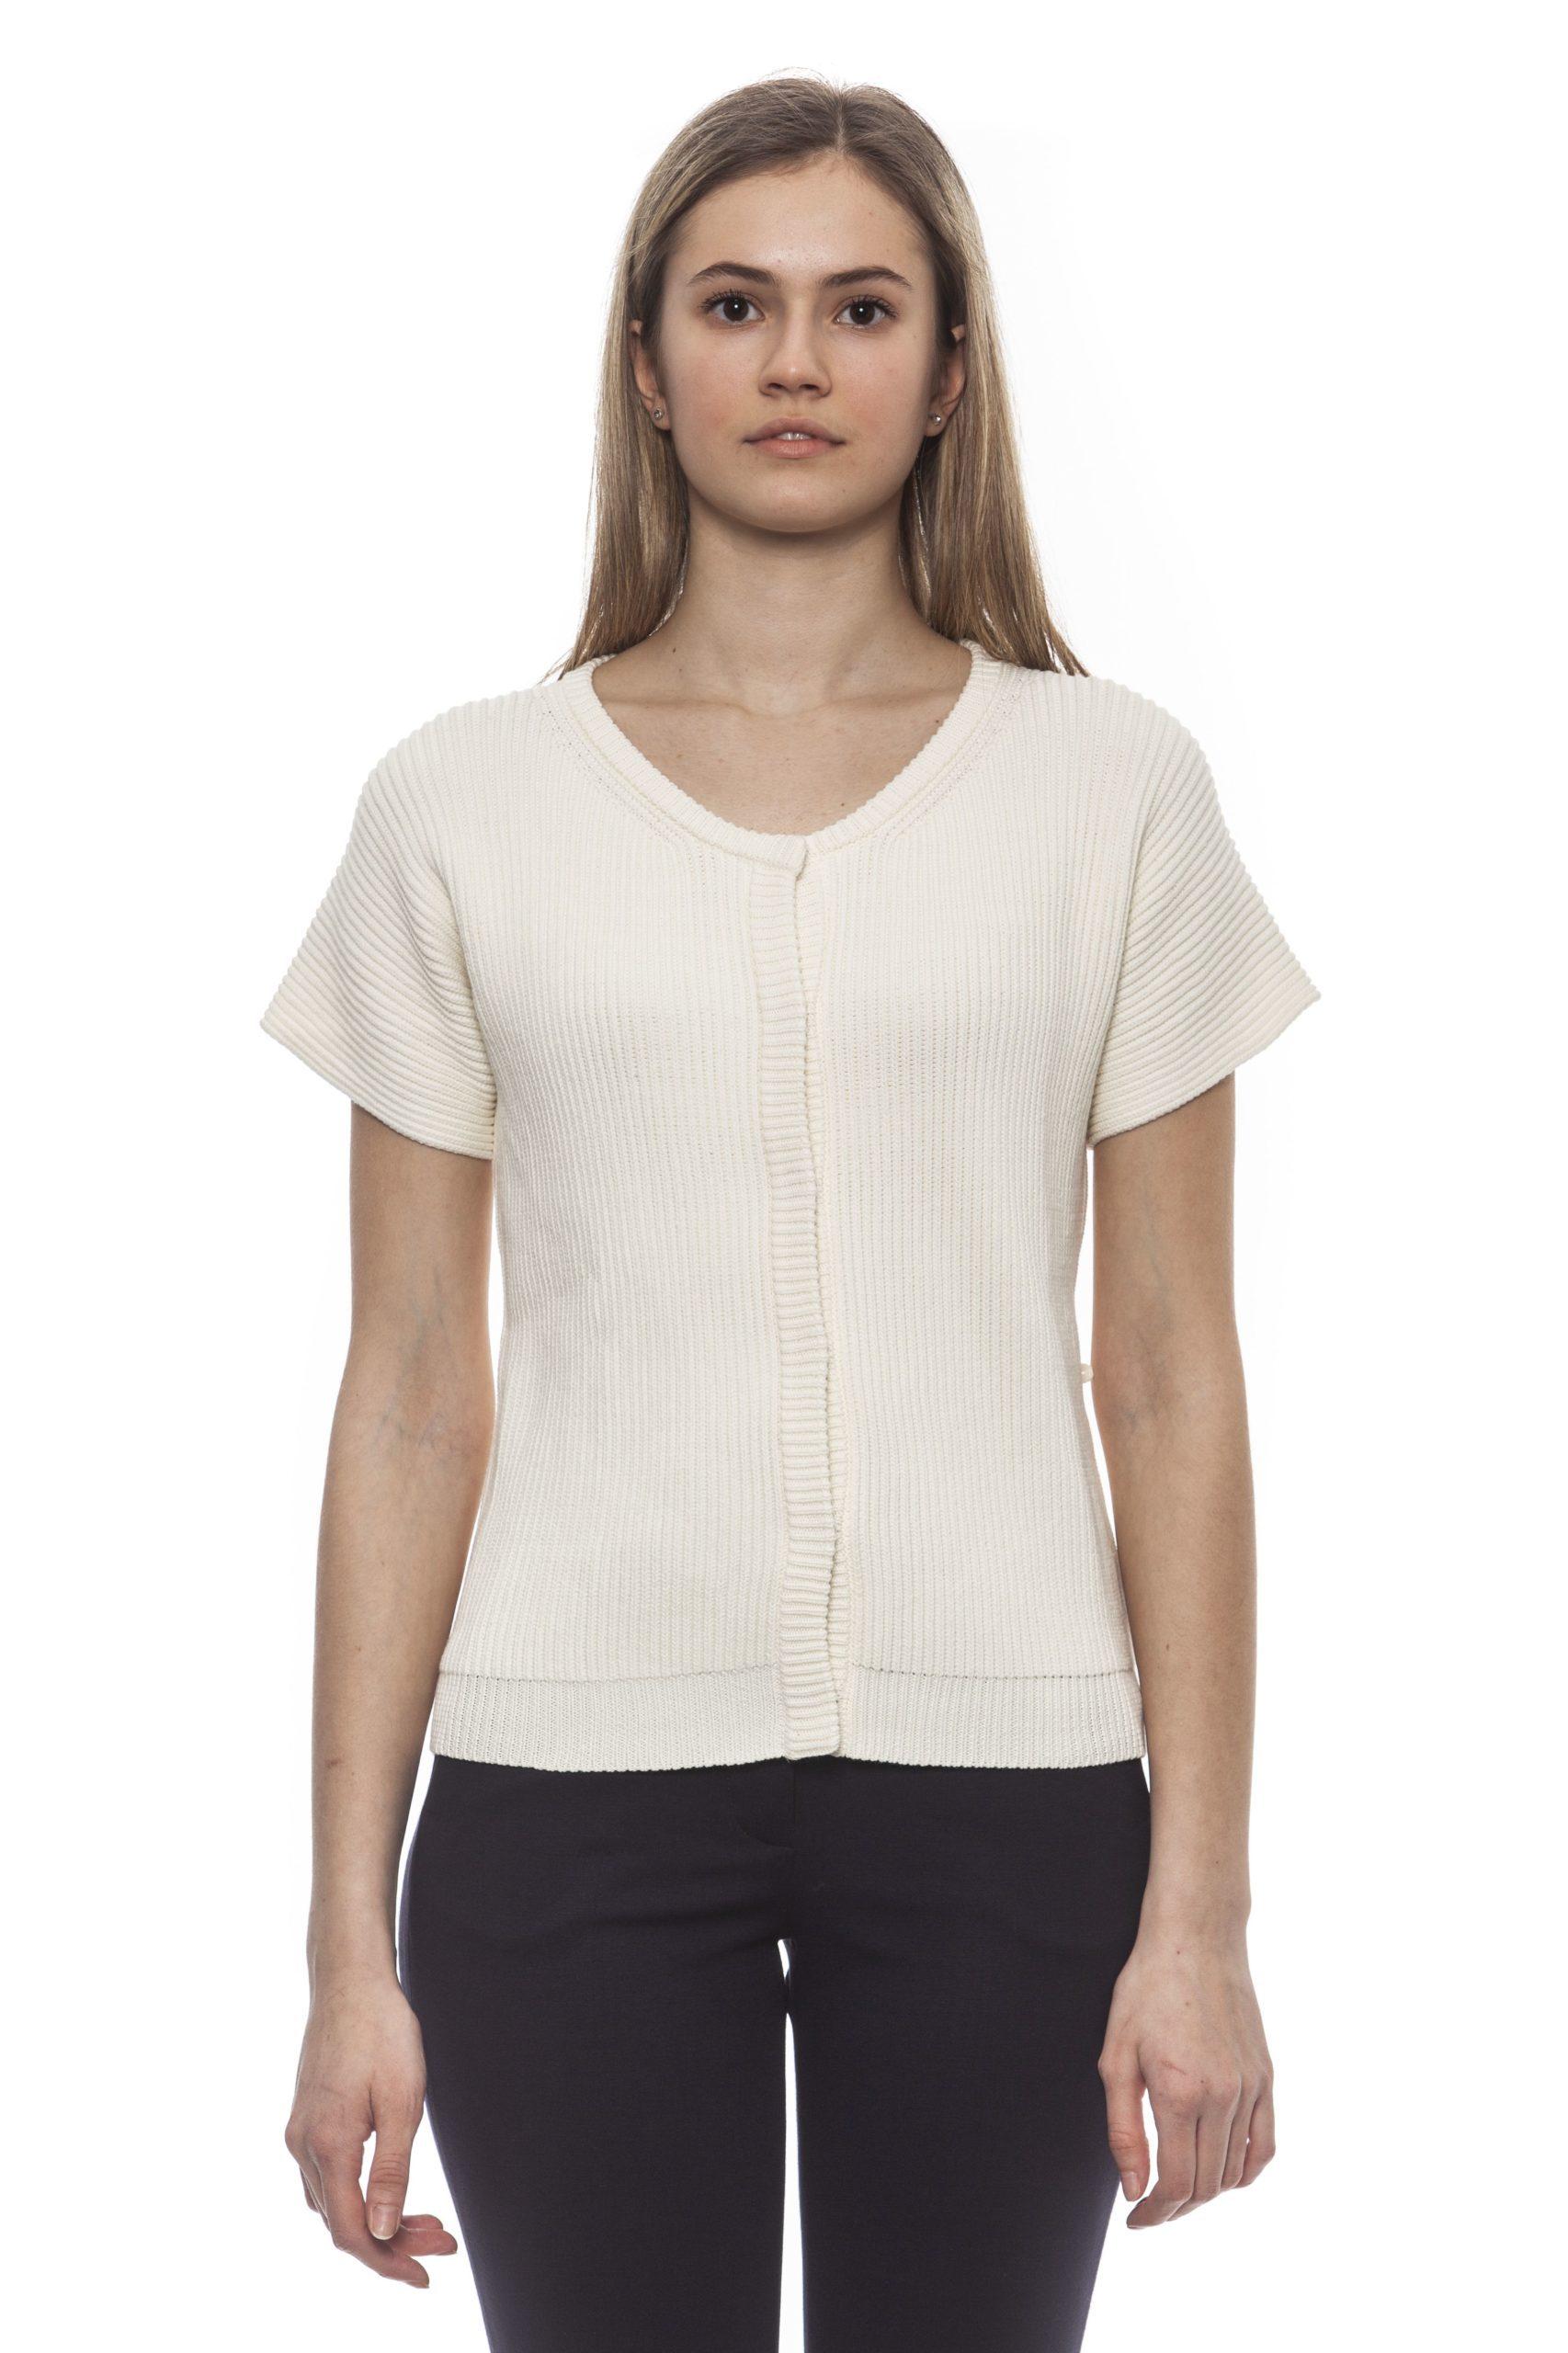 Peserico Women's Bianco Sweater White PE1383071 - IT42 | S